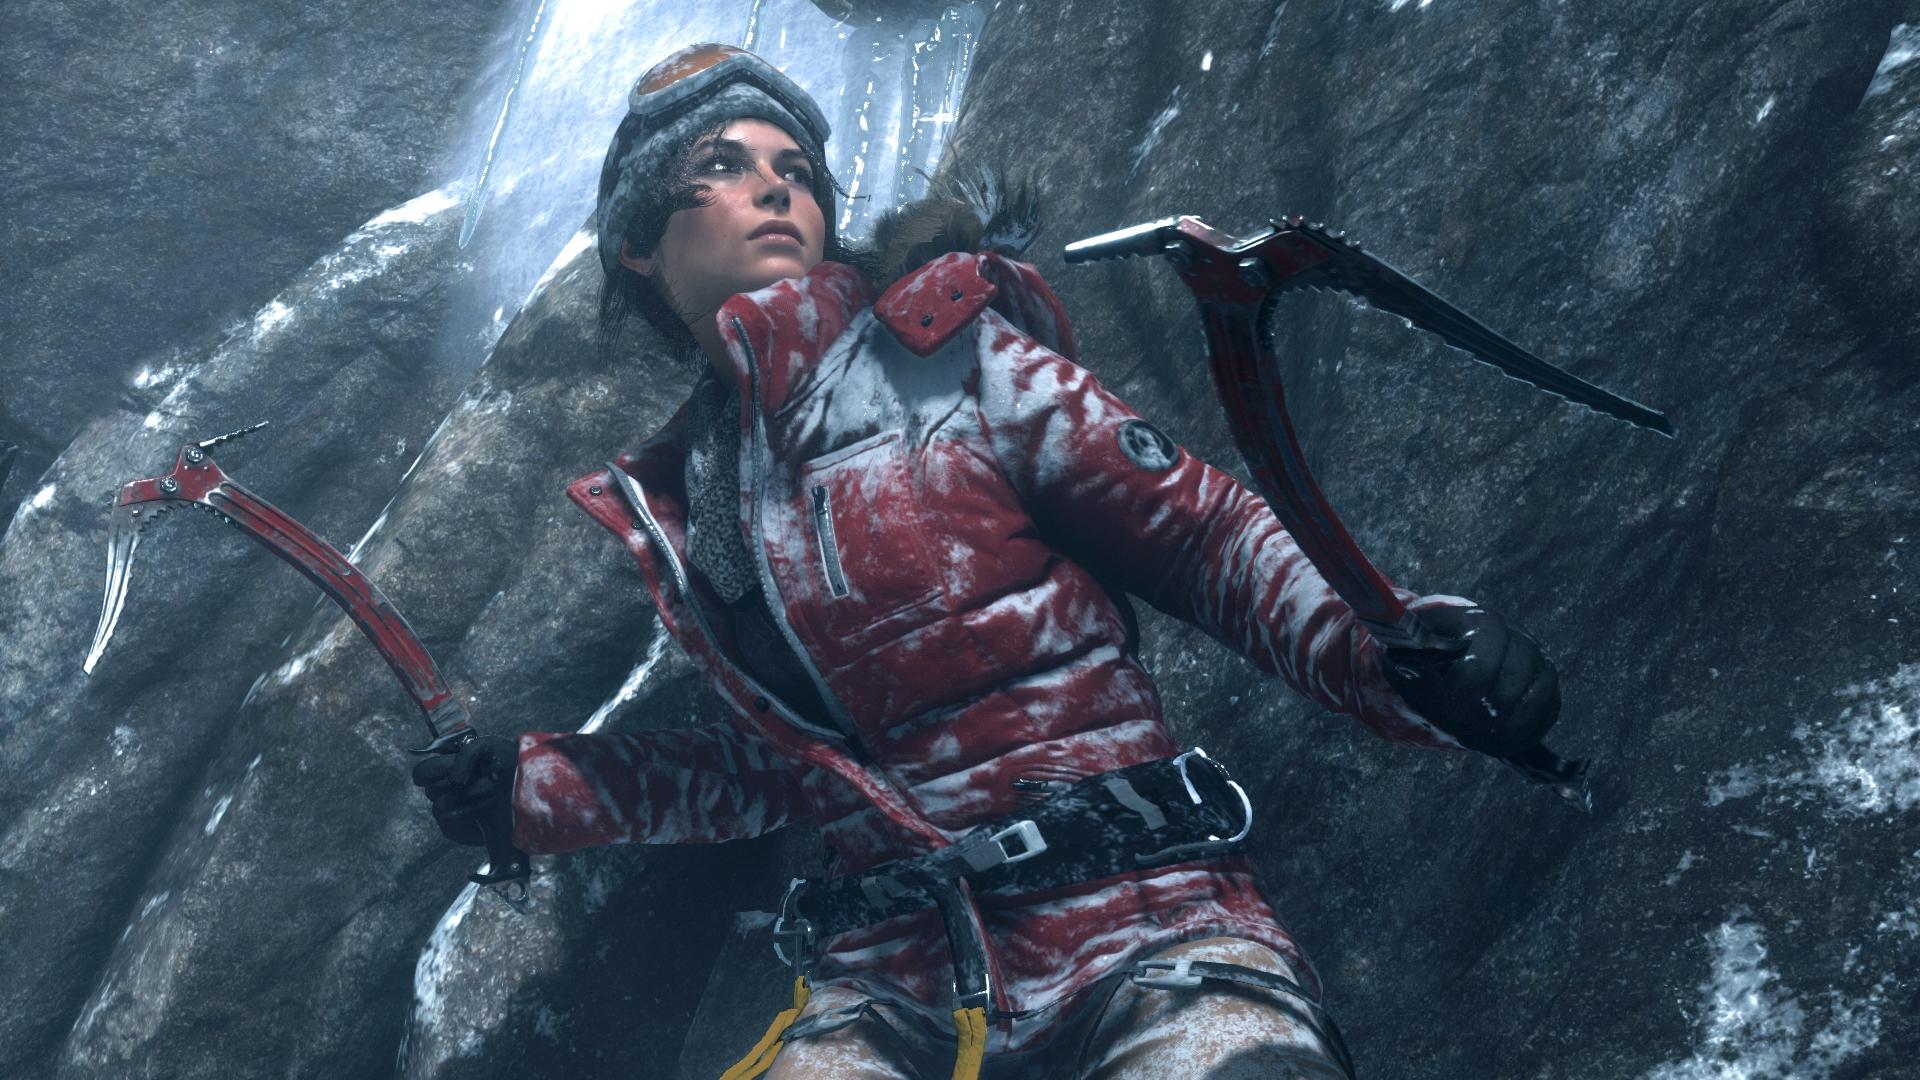 Desktop Wallpapers Rise Of The Tomb Raider Lara Croft 1920x1080